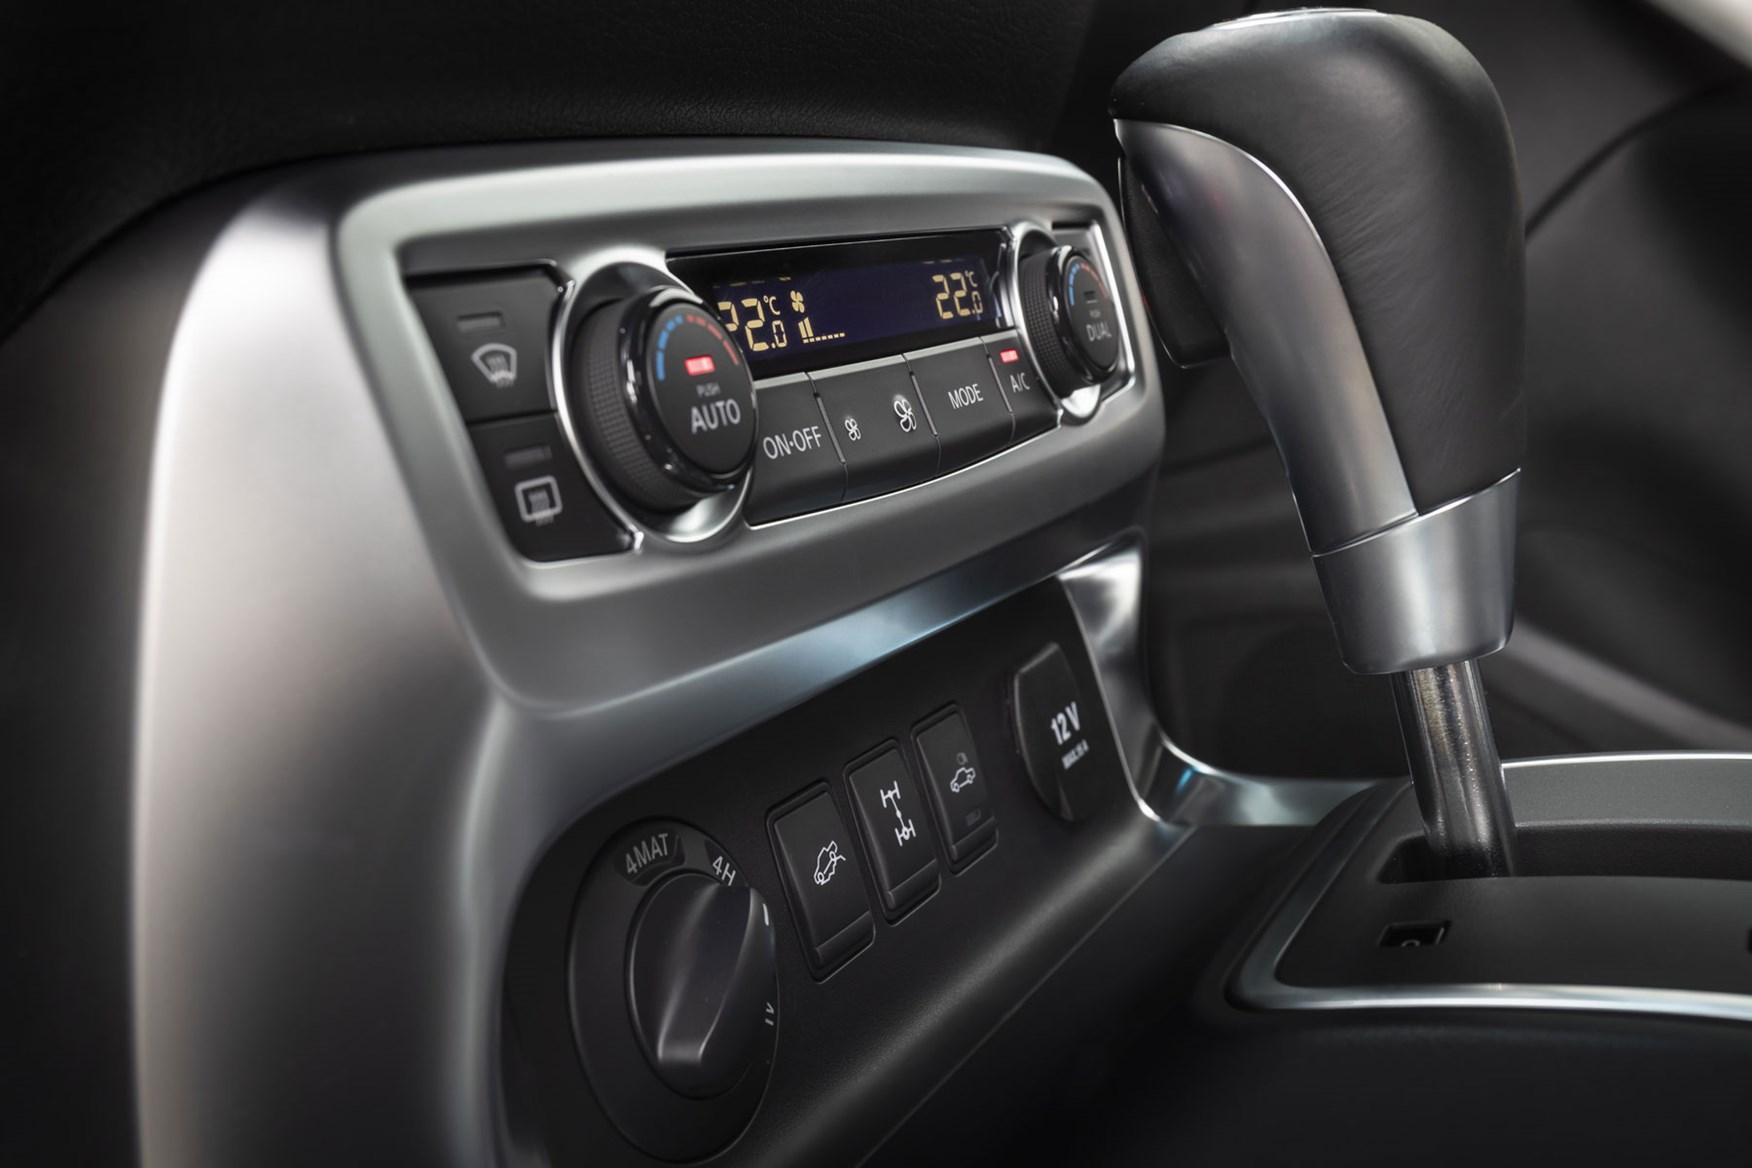 Mercedes X Class X 350 D Power 2018 Review 3 0 Litre V6 Turbo